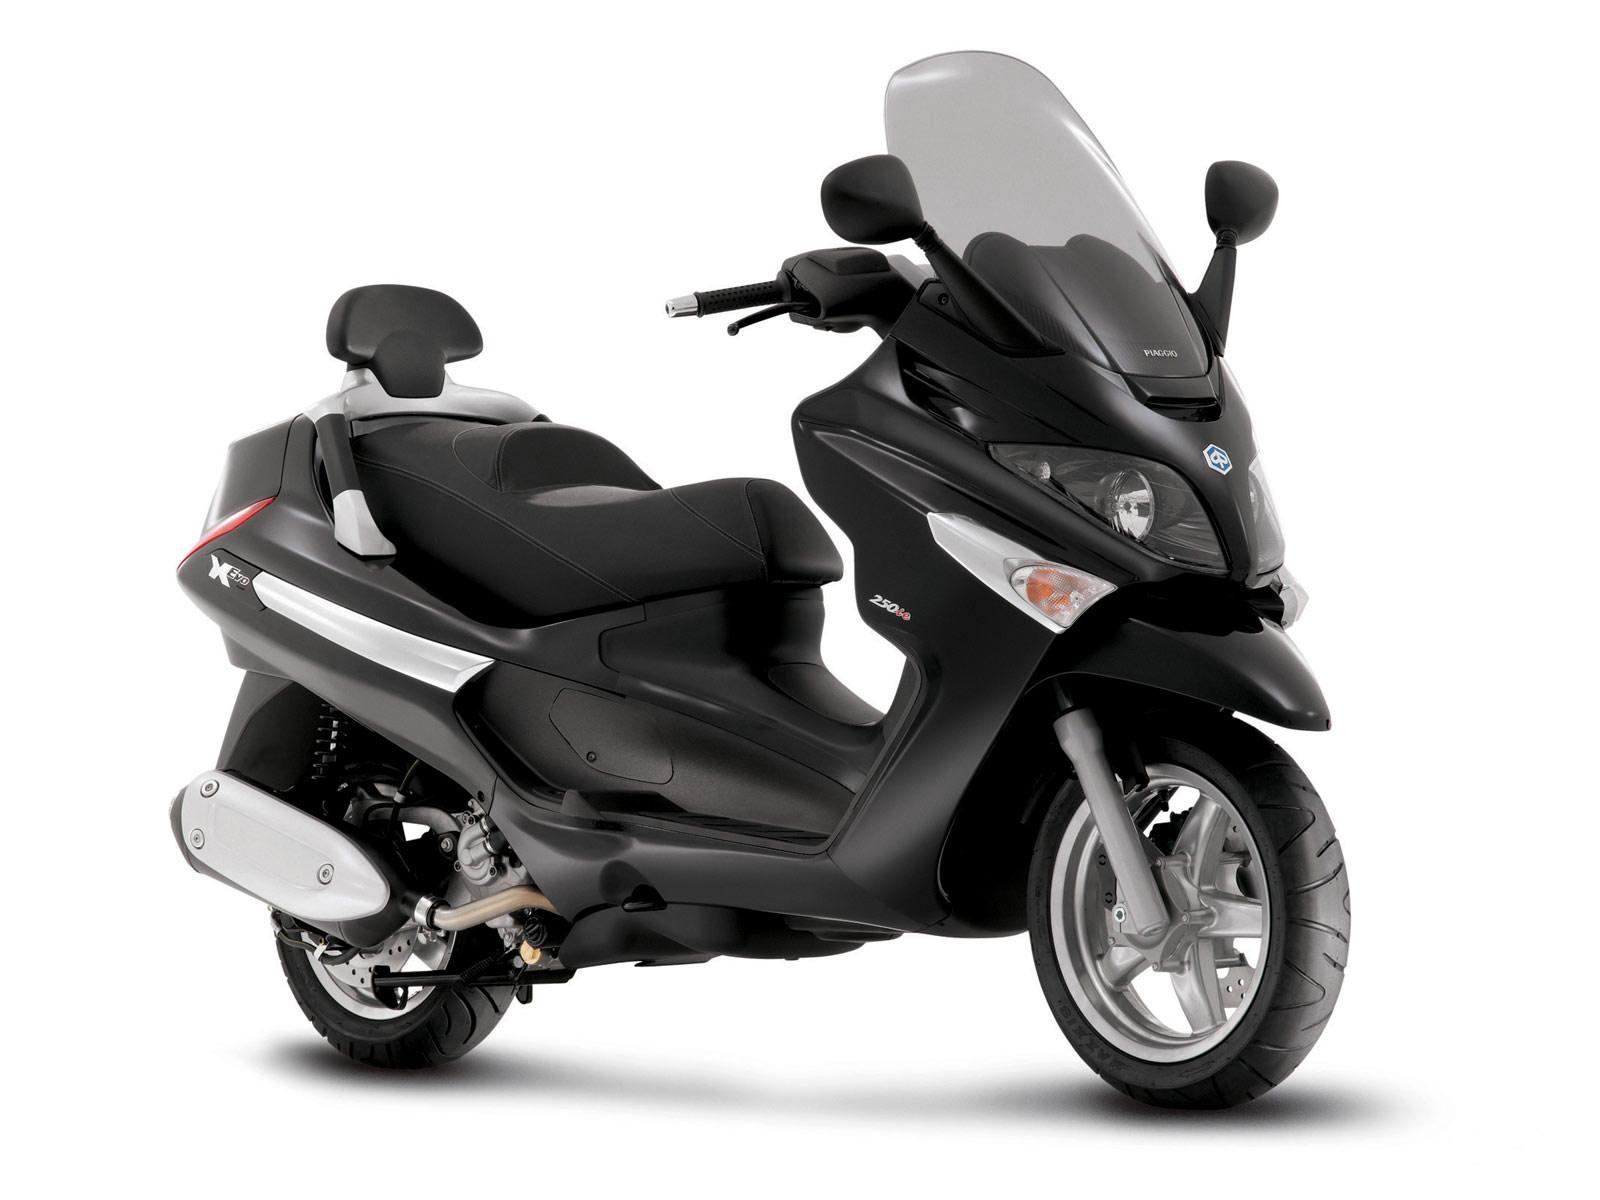 Piaggio Scooter Pictures 2007 X9 Evolution 500